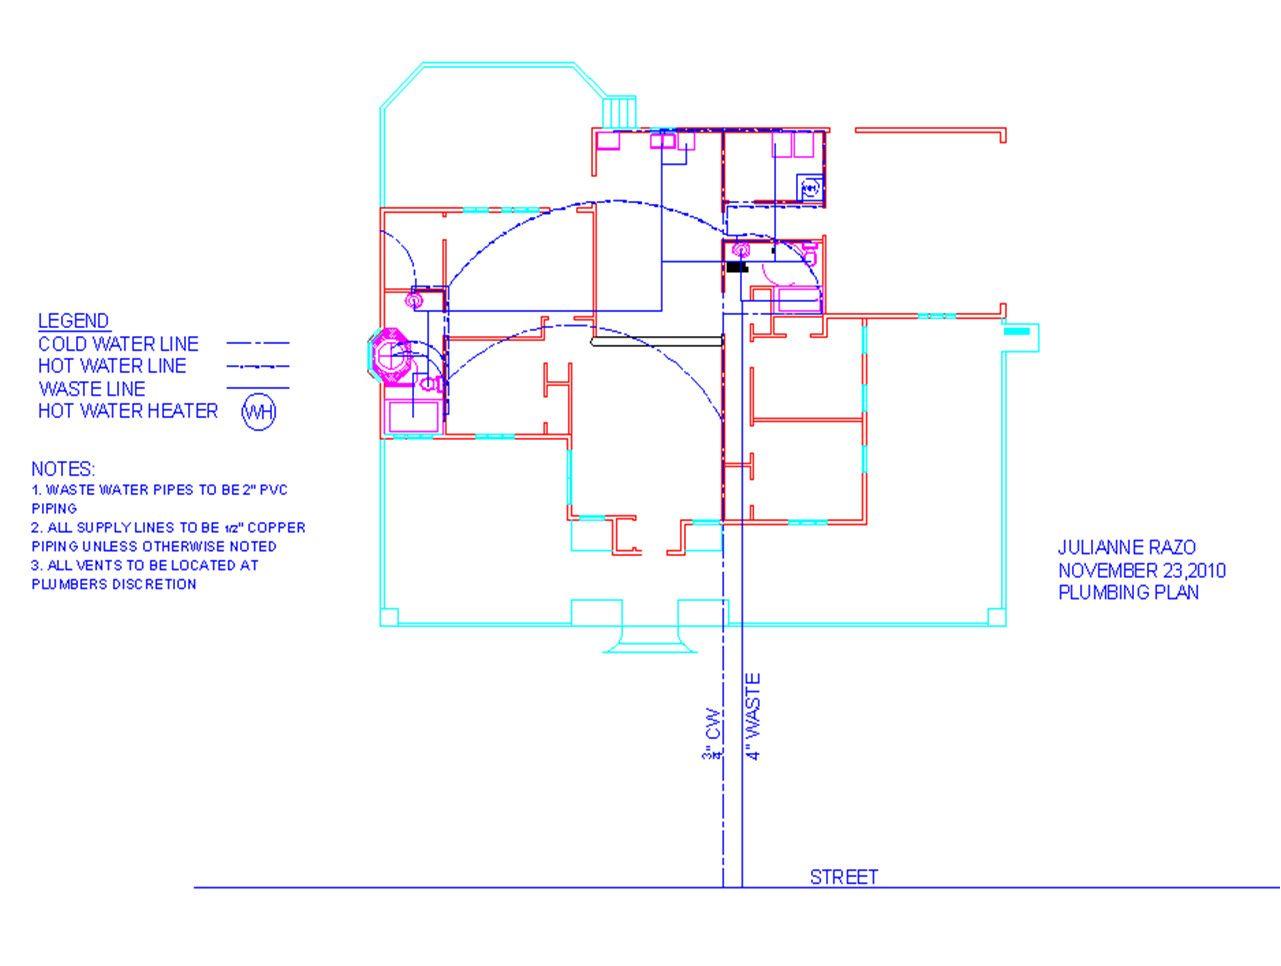 Plumbing Plan Building Science Pinterest House Bright Residential Plans House Design Industrial Decor Living Room Design